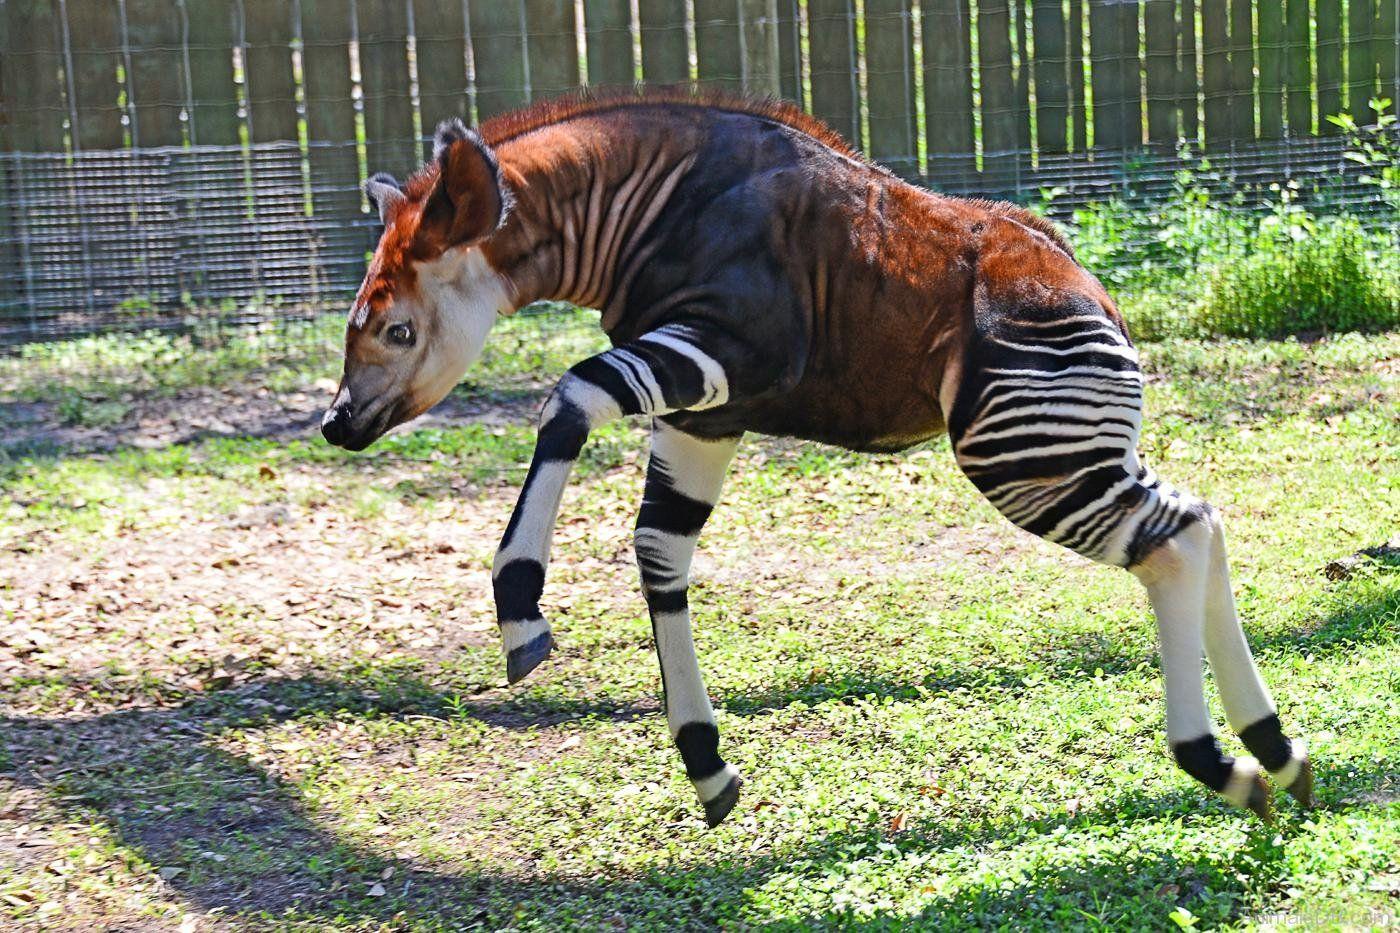 Okapi - Page 14 of 23 - OMG LANE | Creepy animals, Unusual animals, Scary  animals